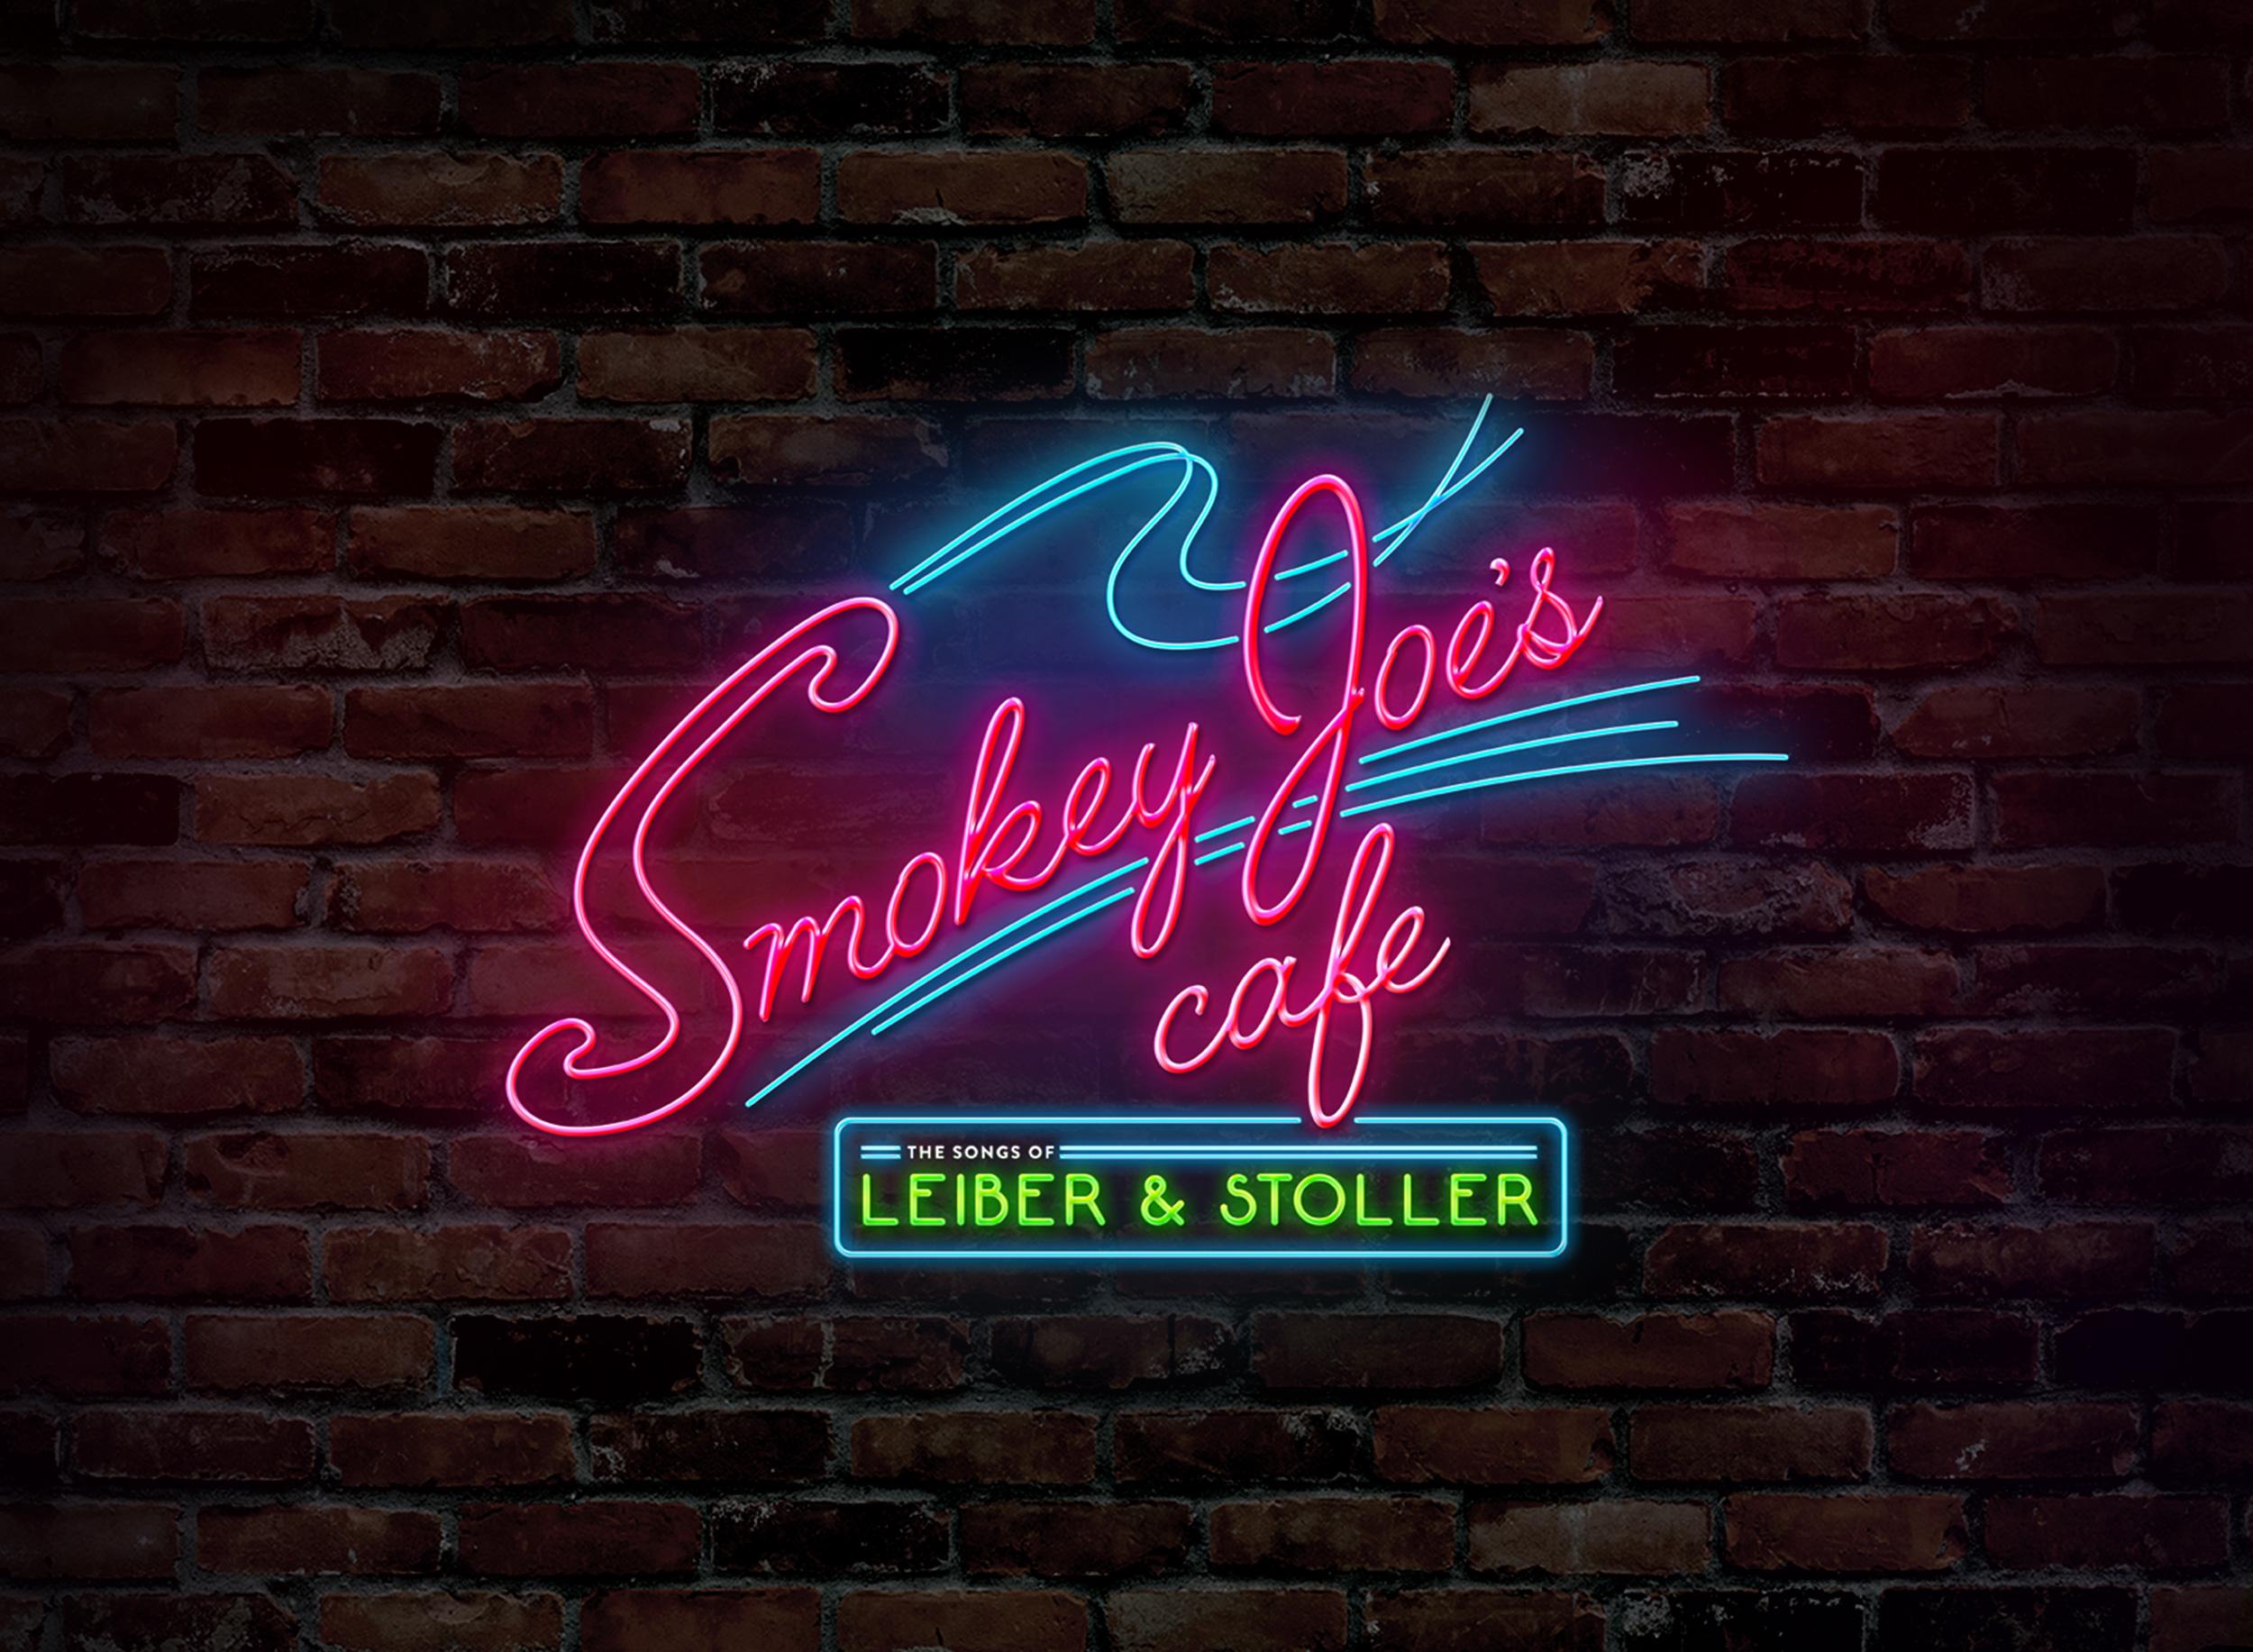 Smokey Joes Cafe pic.jpg